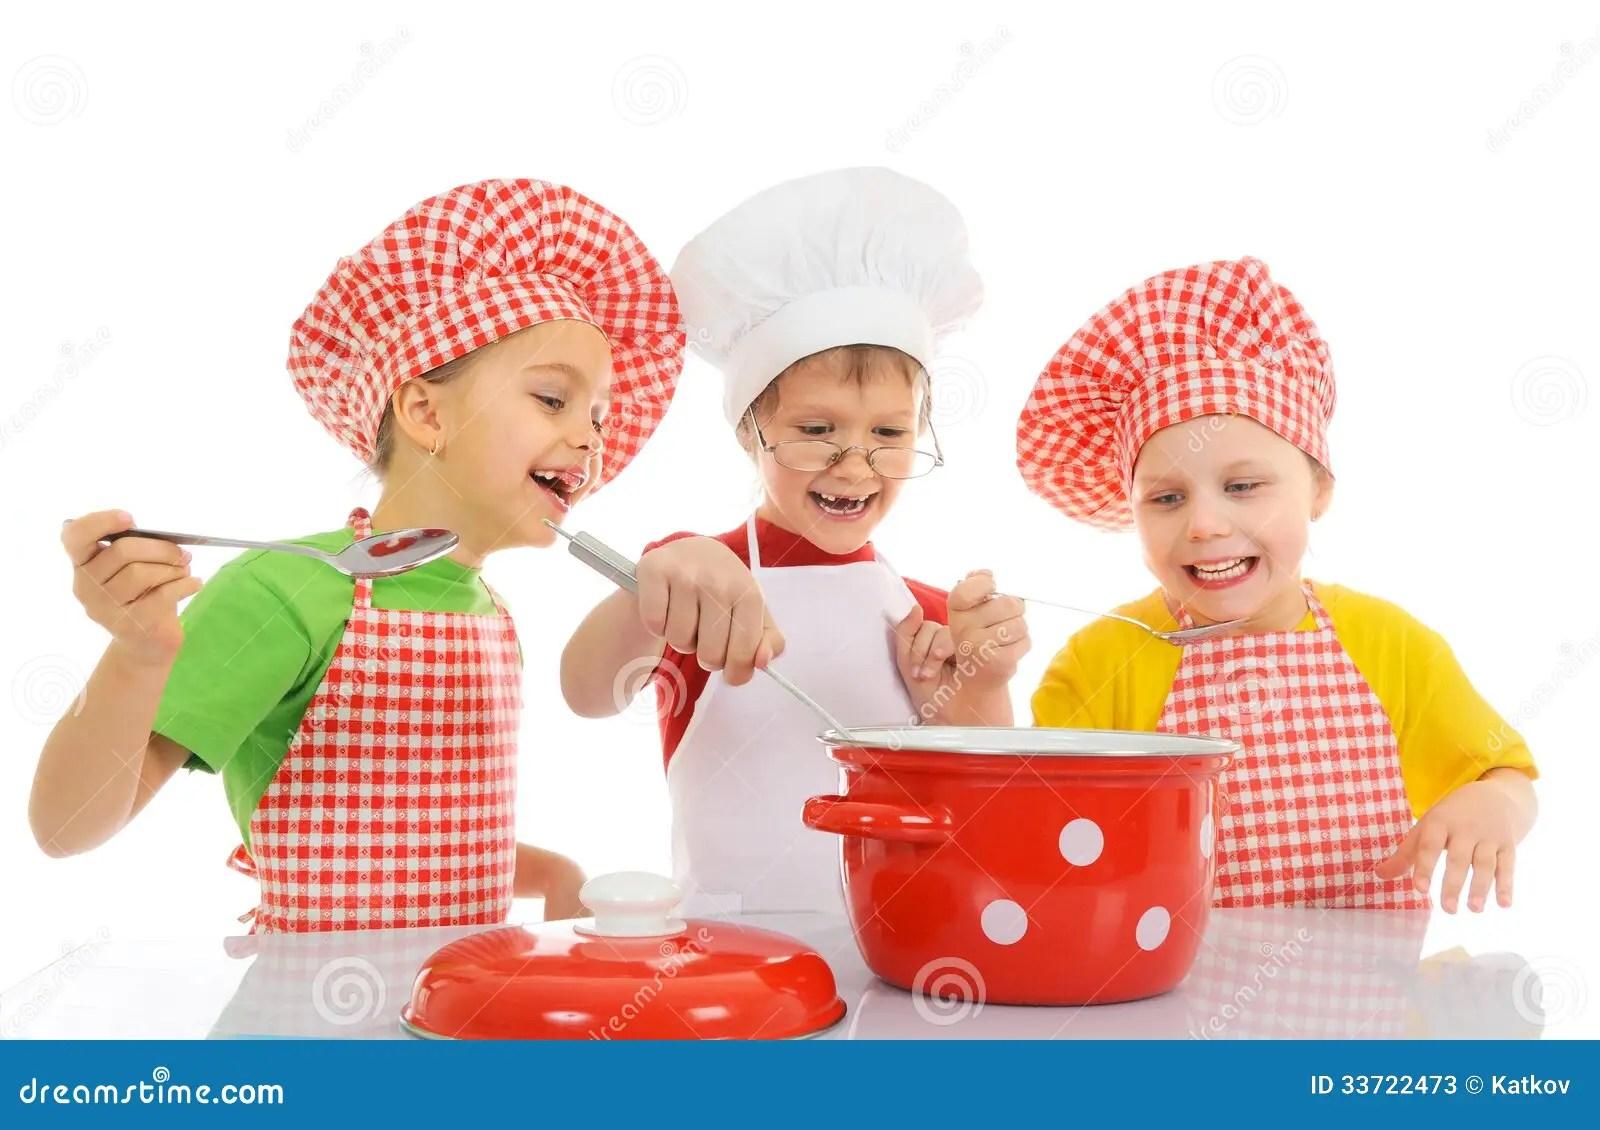 Cute Chef Wallpaper Funny Little Chefs Stock Image Image Of Idea Closeup